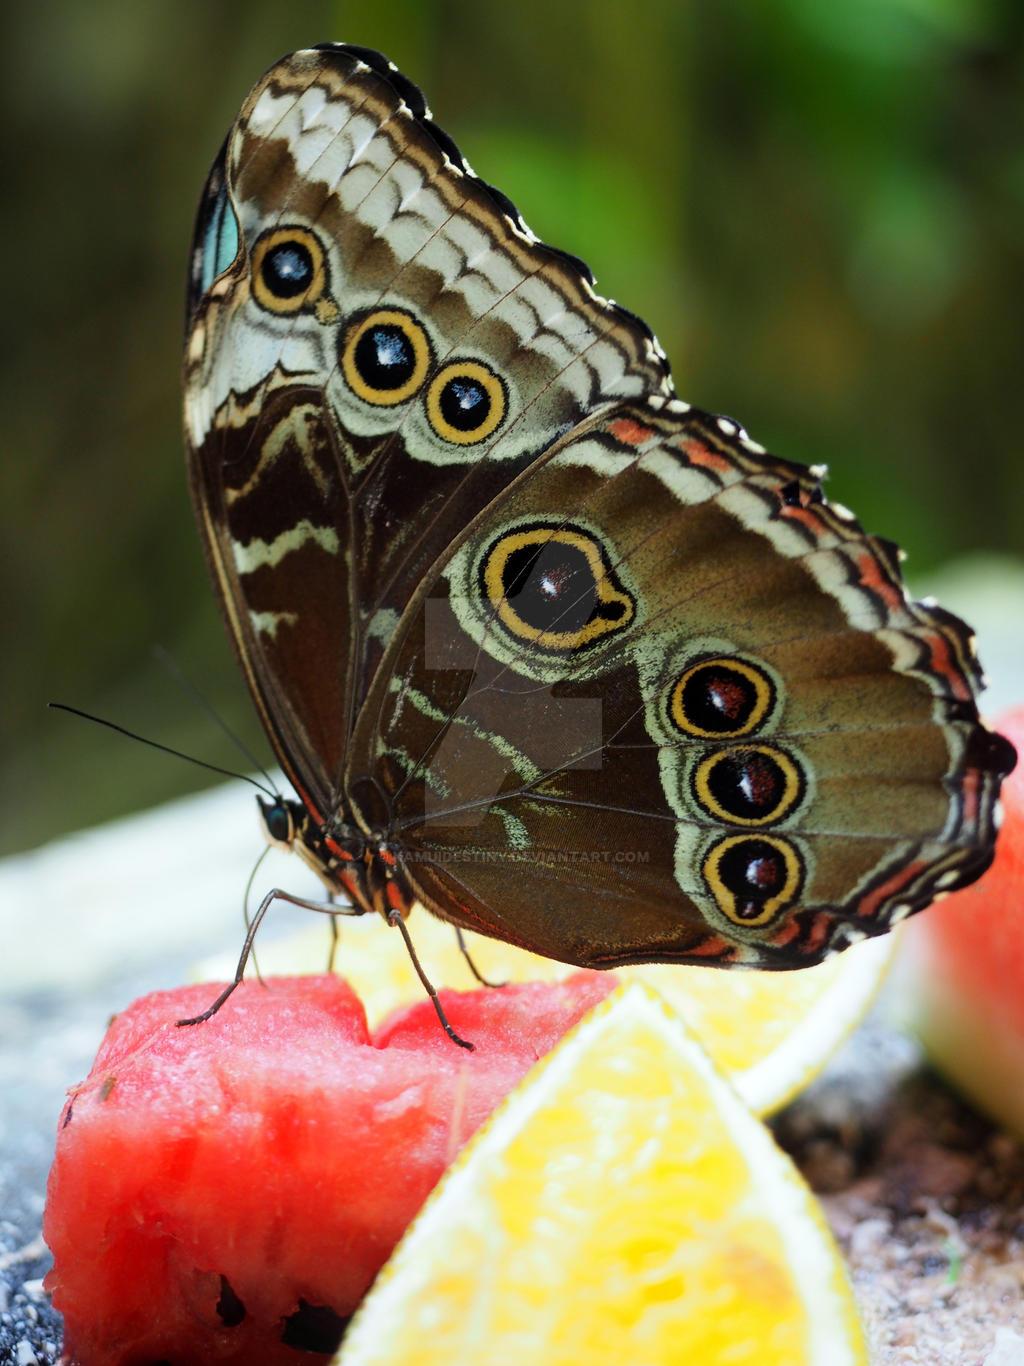 Sweet Nectar of Life